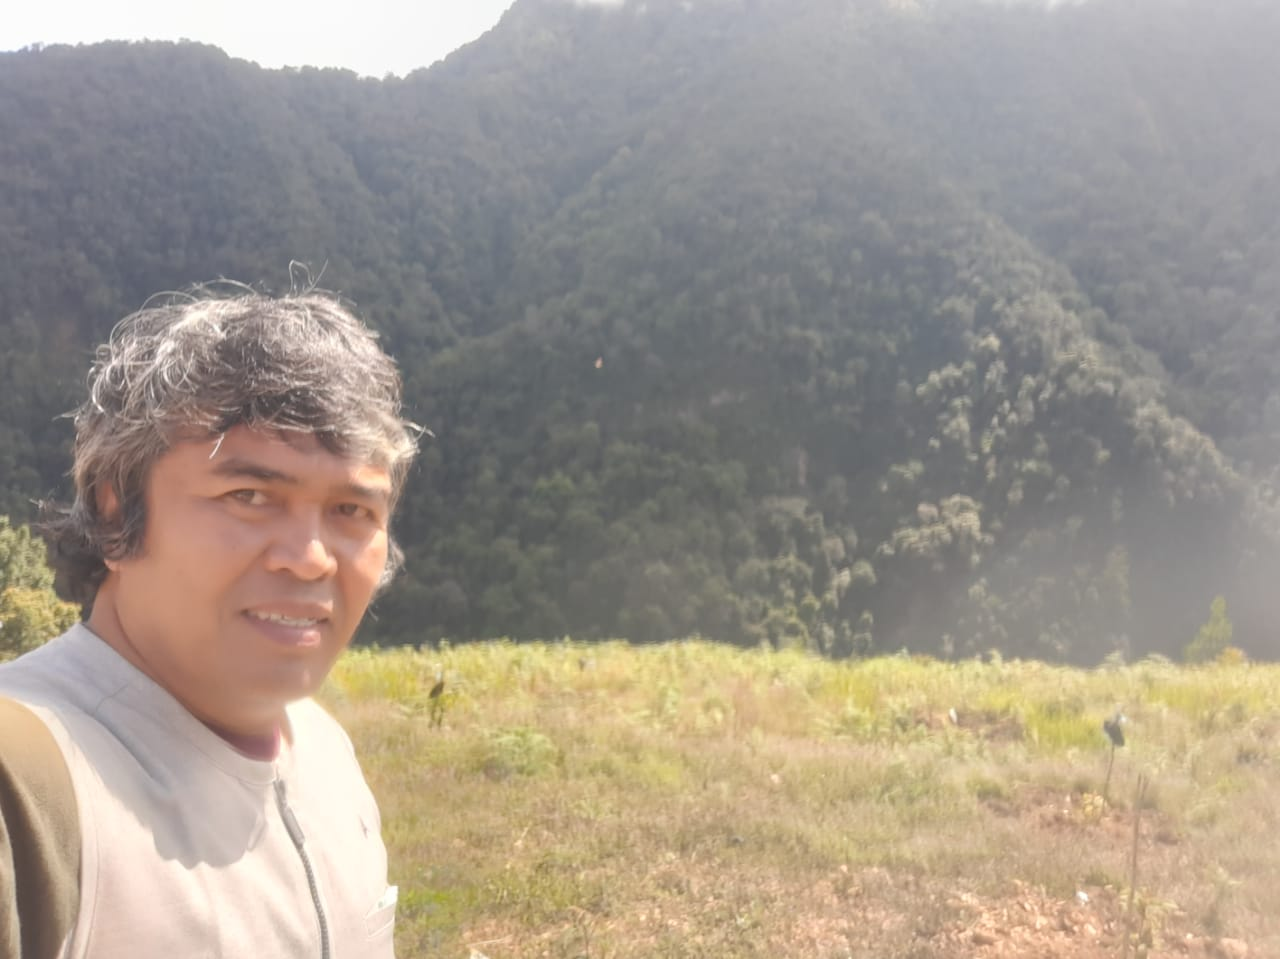 Satwa Langka Dijadikan Objek Transaksi Ilegal, HAKA Sebut Akibat Krisis Habitat